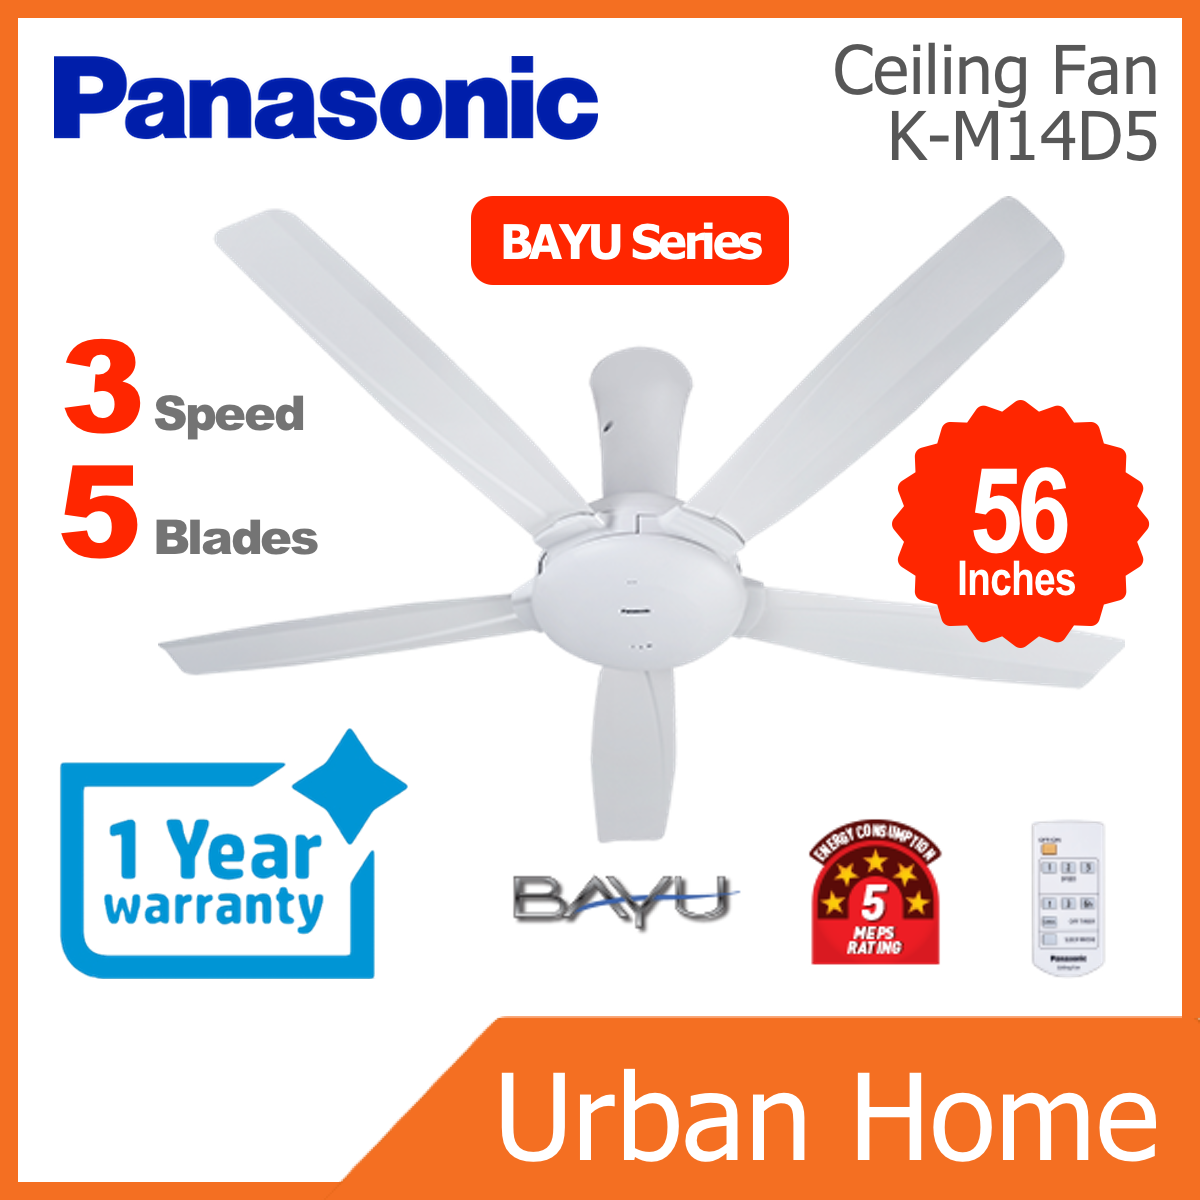 "PANASONIC 56"" BAYU 5 Blade Remote Control Ceiling Fan (F-M14DZ/FM14DZ/F-M14D5/FM14D5)"